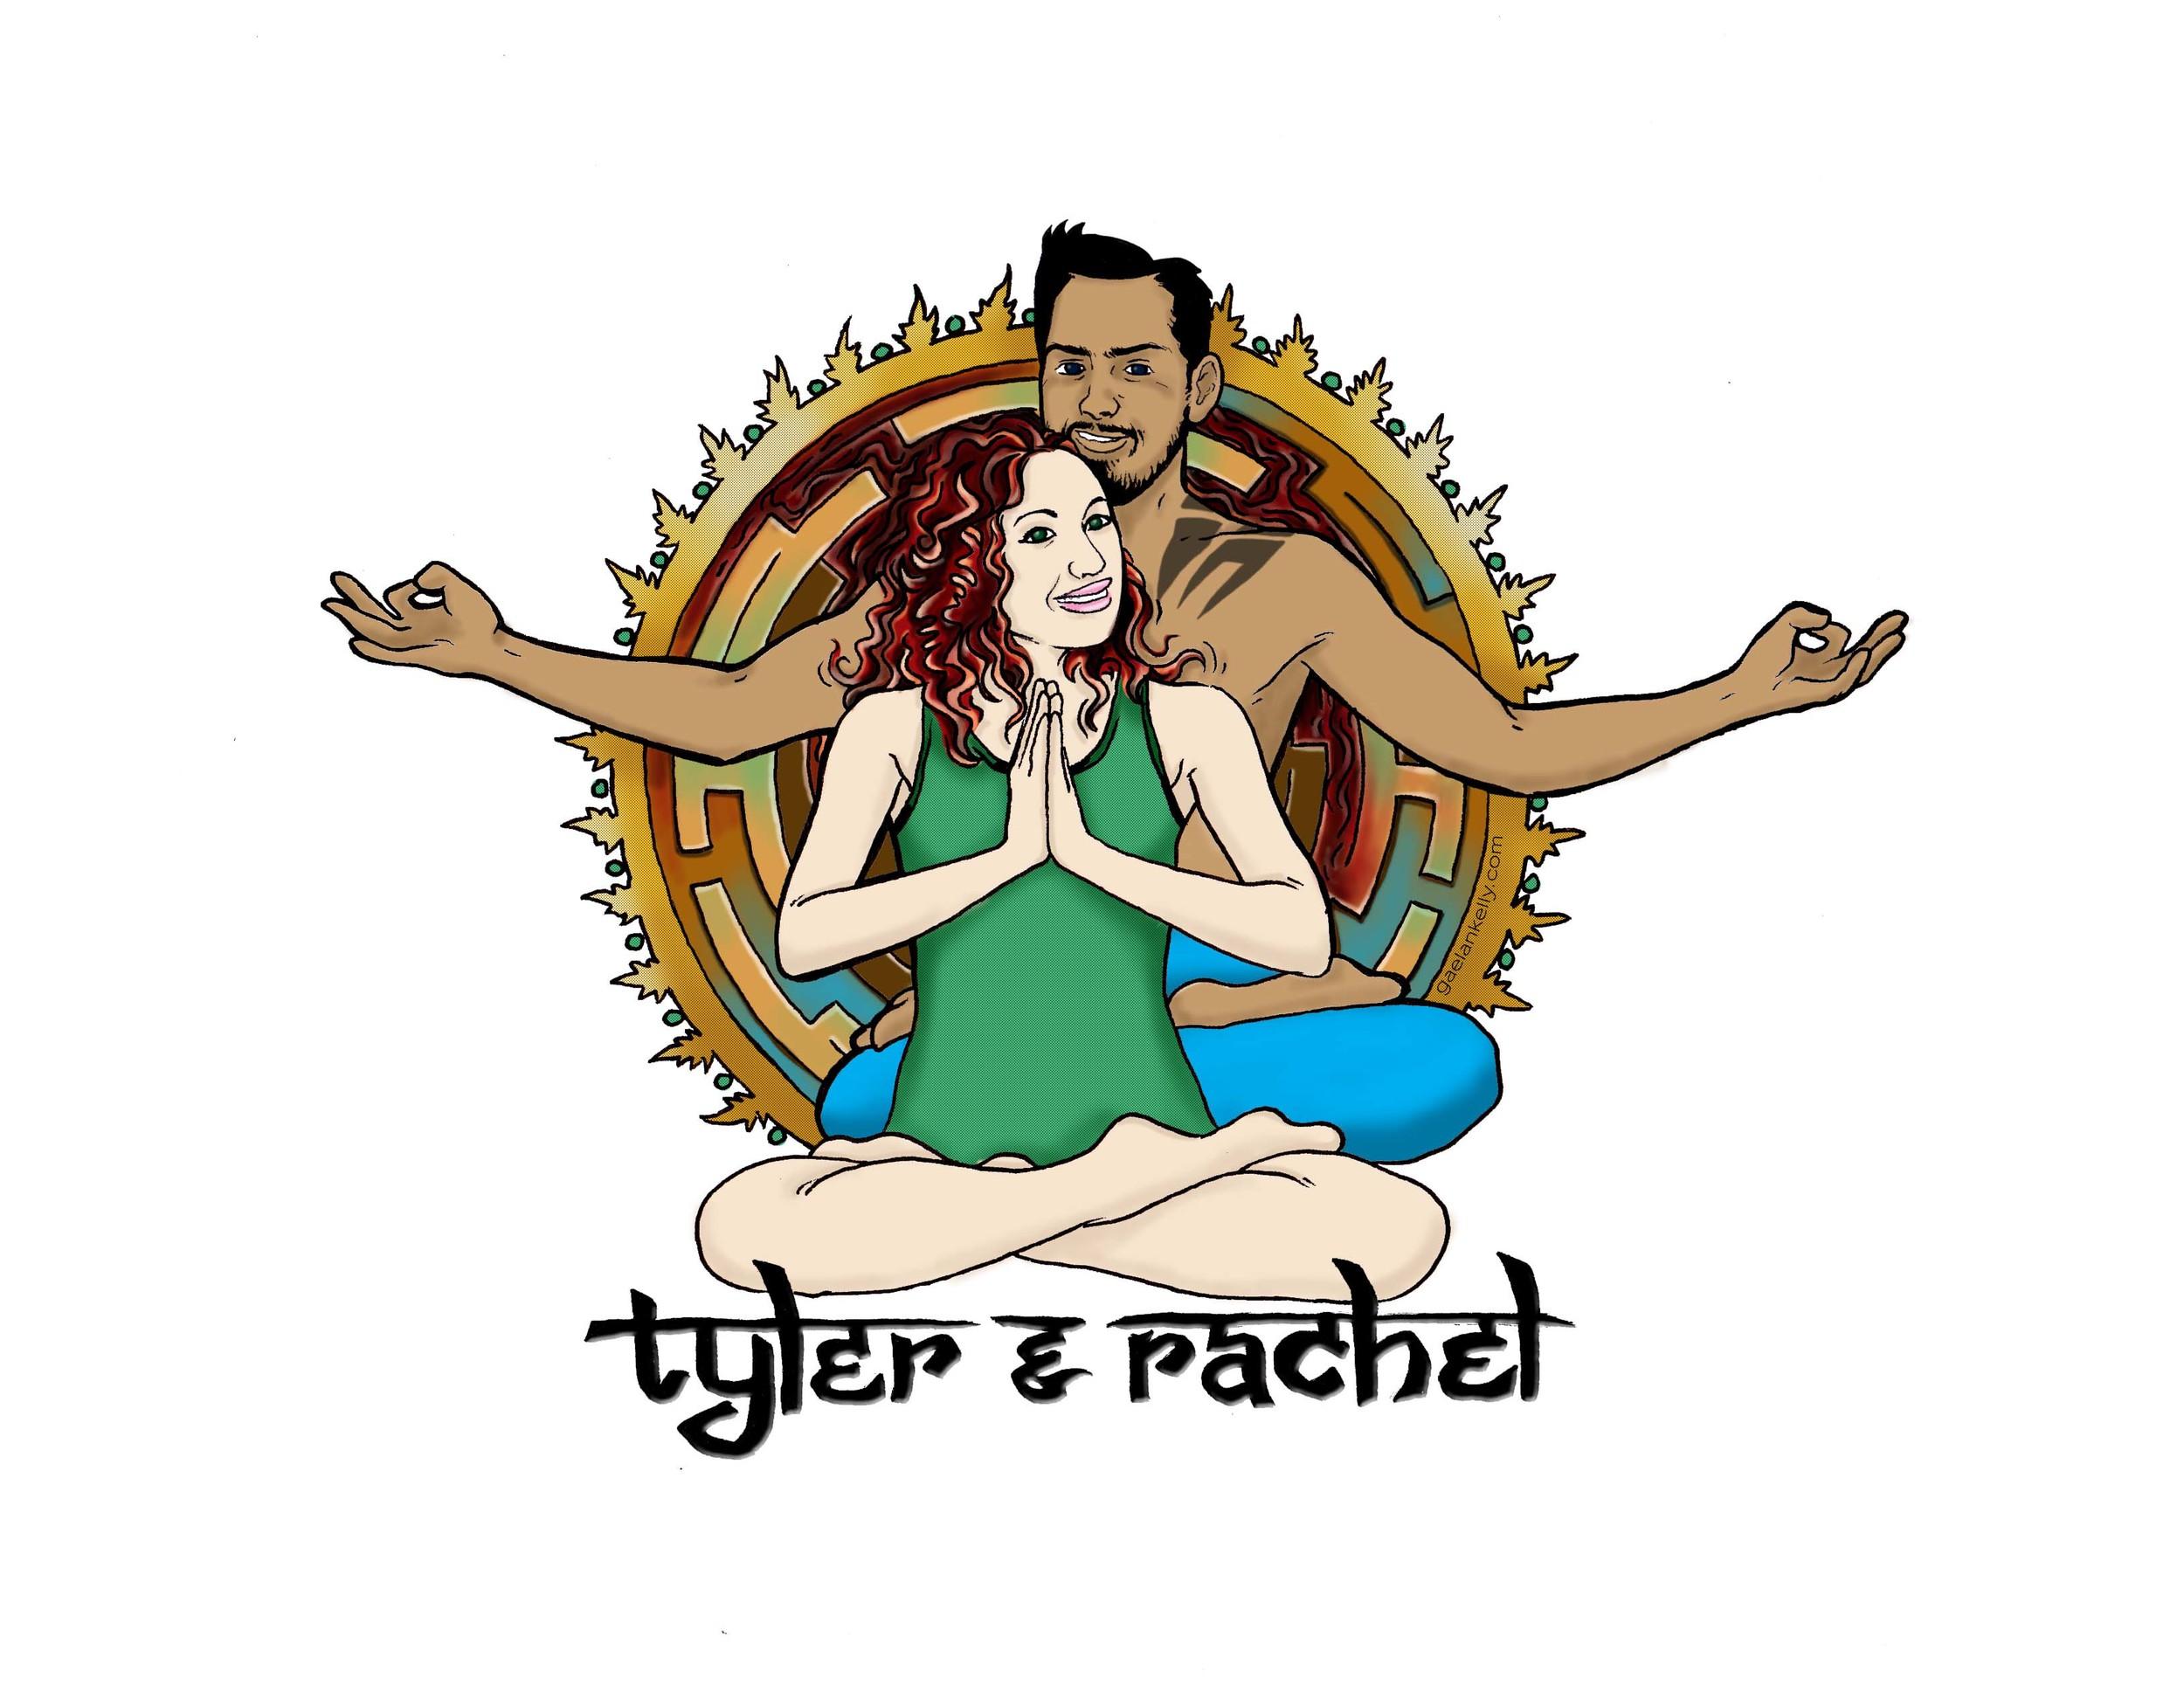 Rachel and Tyler.jpg